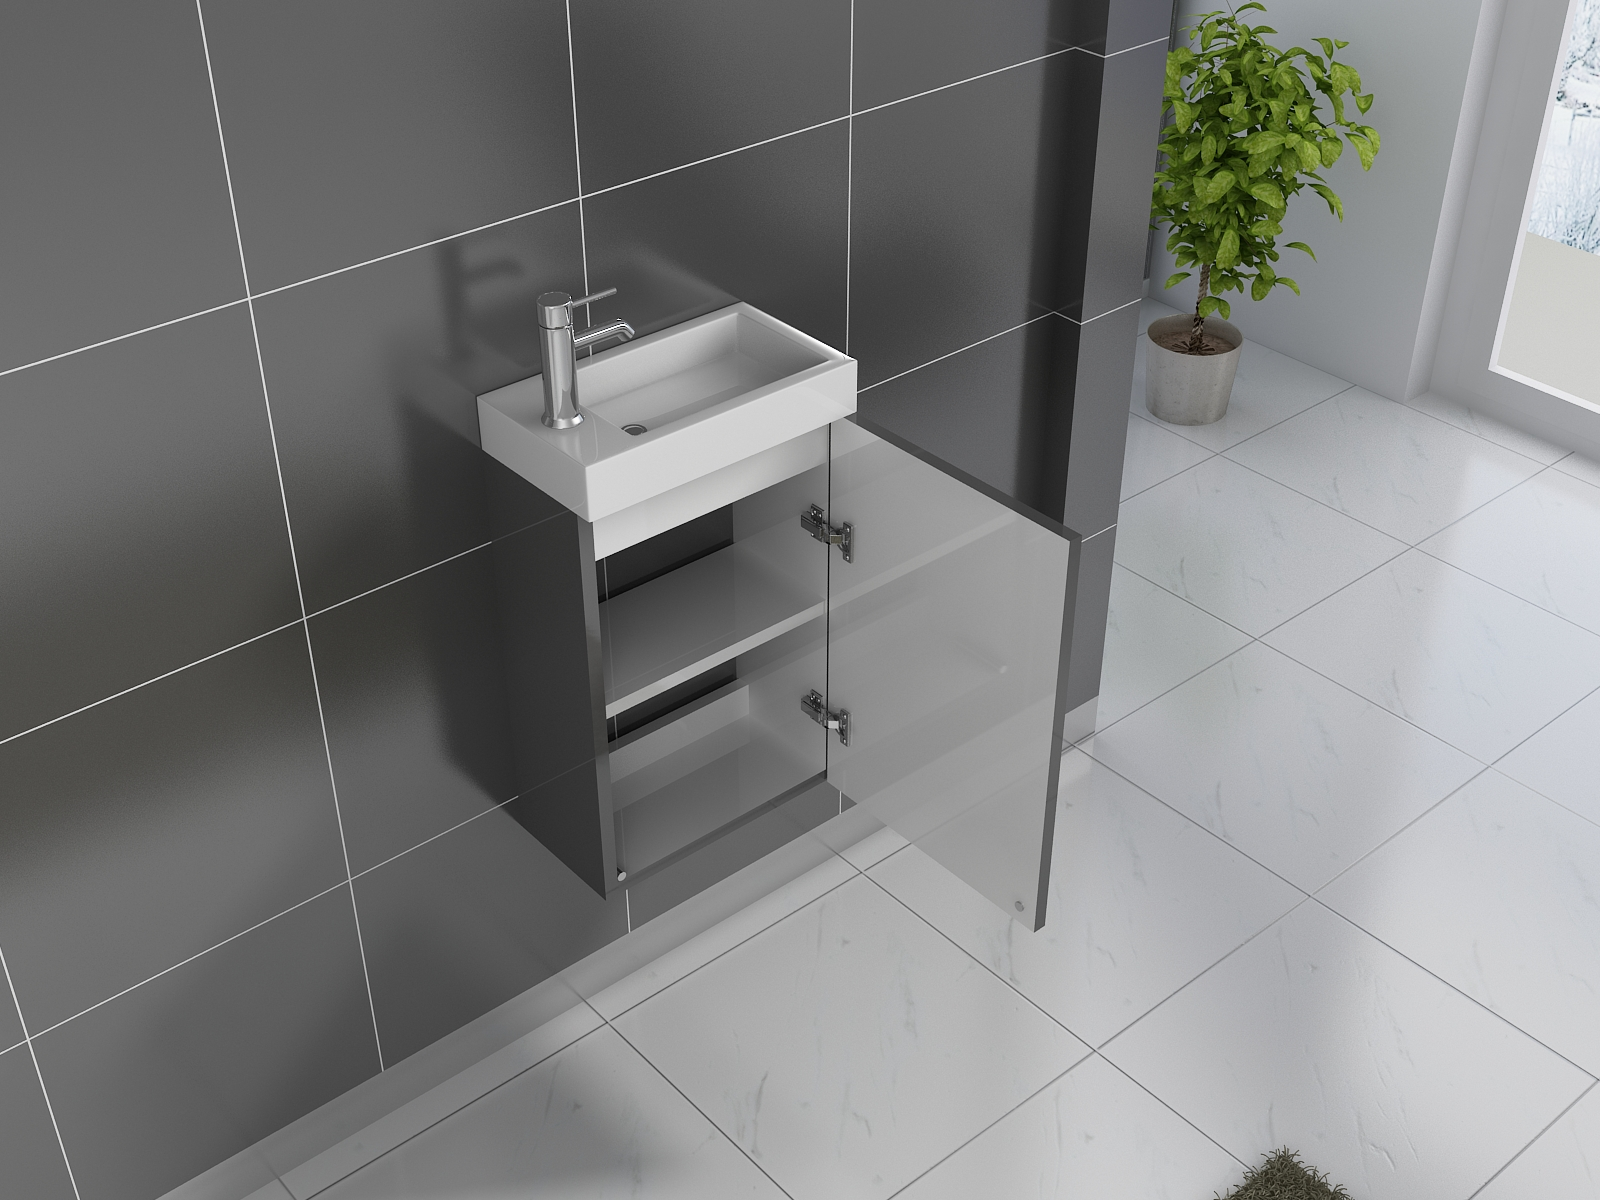 Sam badezimmer waschplatz grau hochglanz vega demn chst for Badezimmer grau